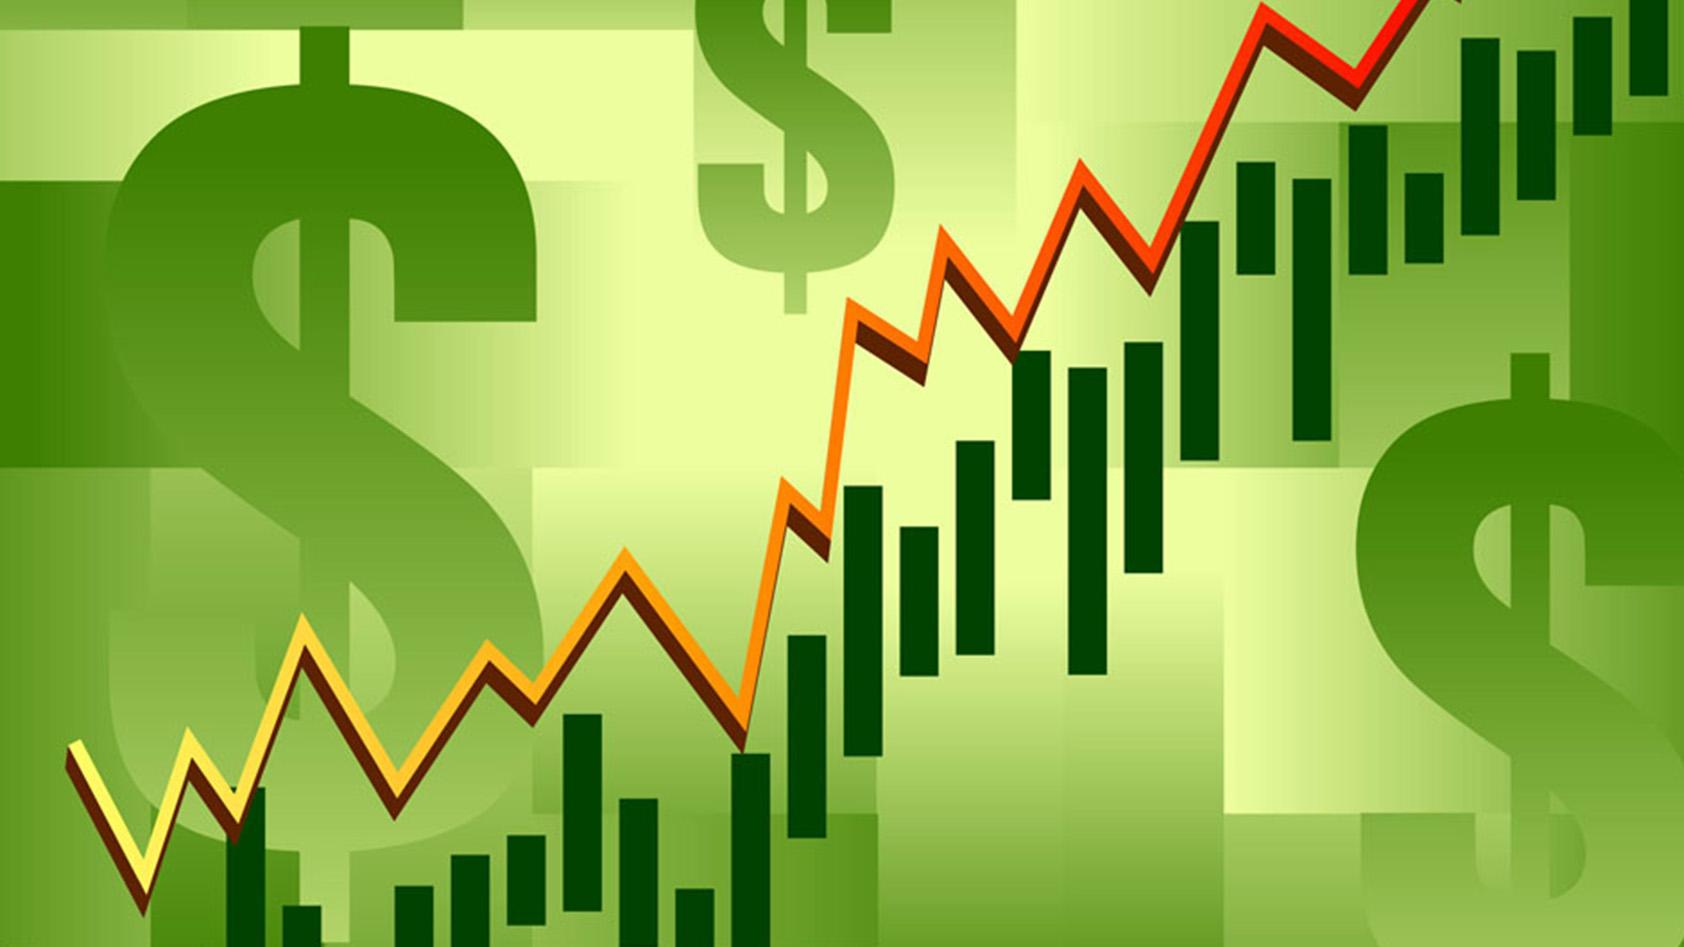 Good economic forecast graphic